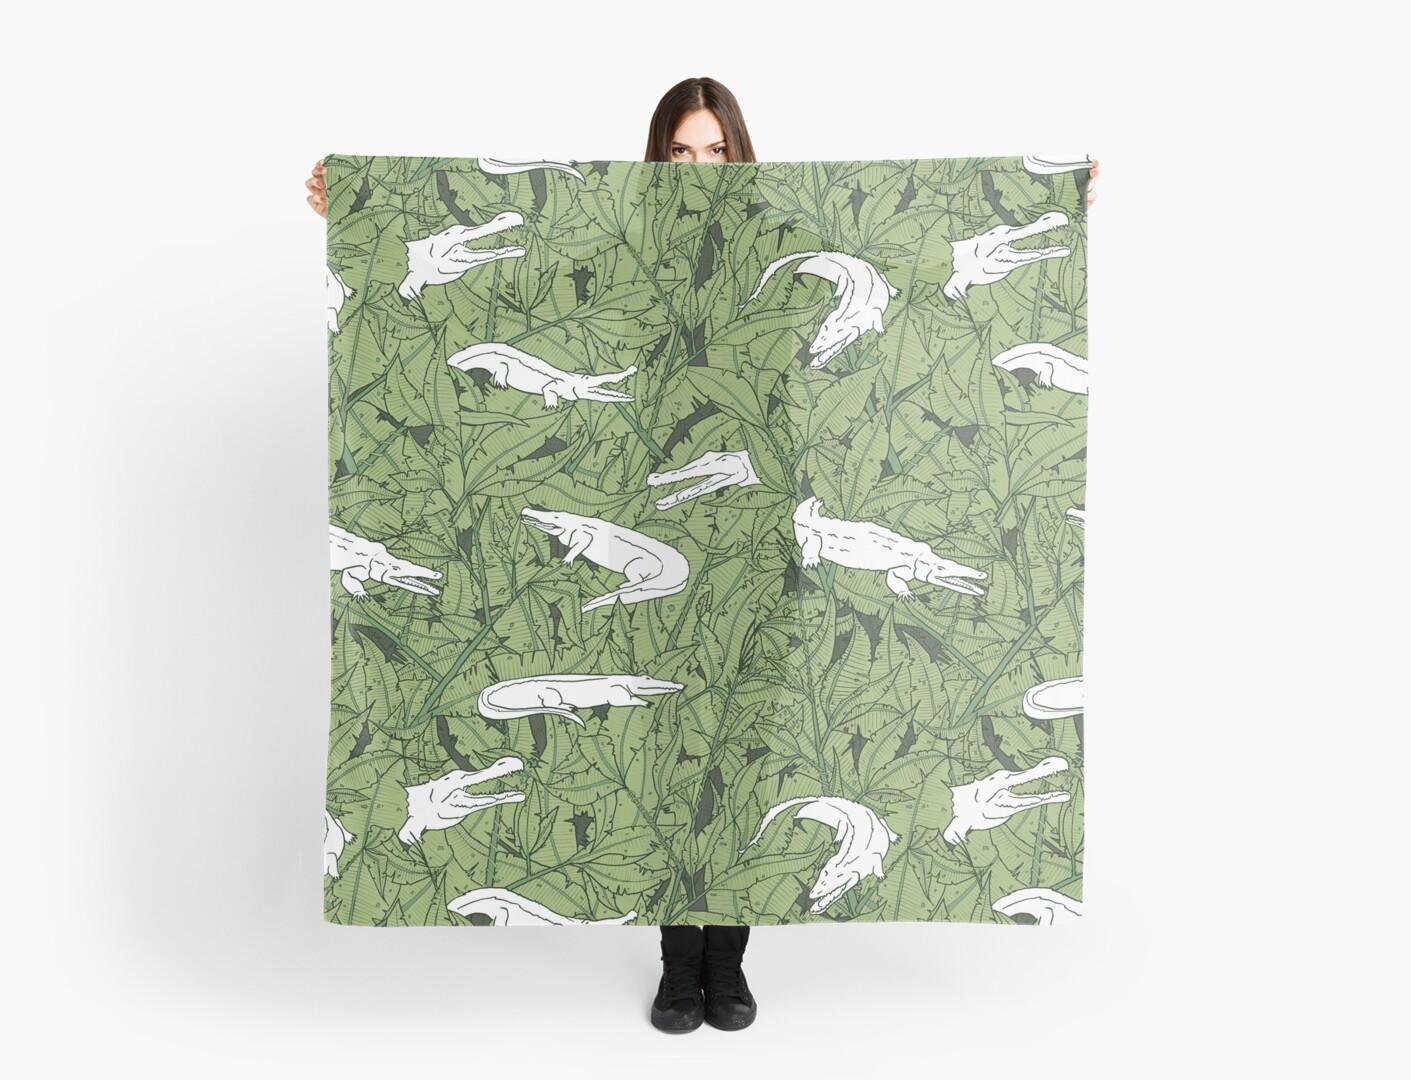 CROCODILES by veenprints